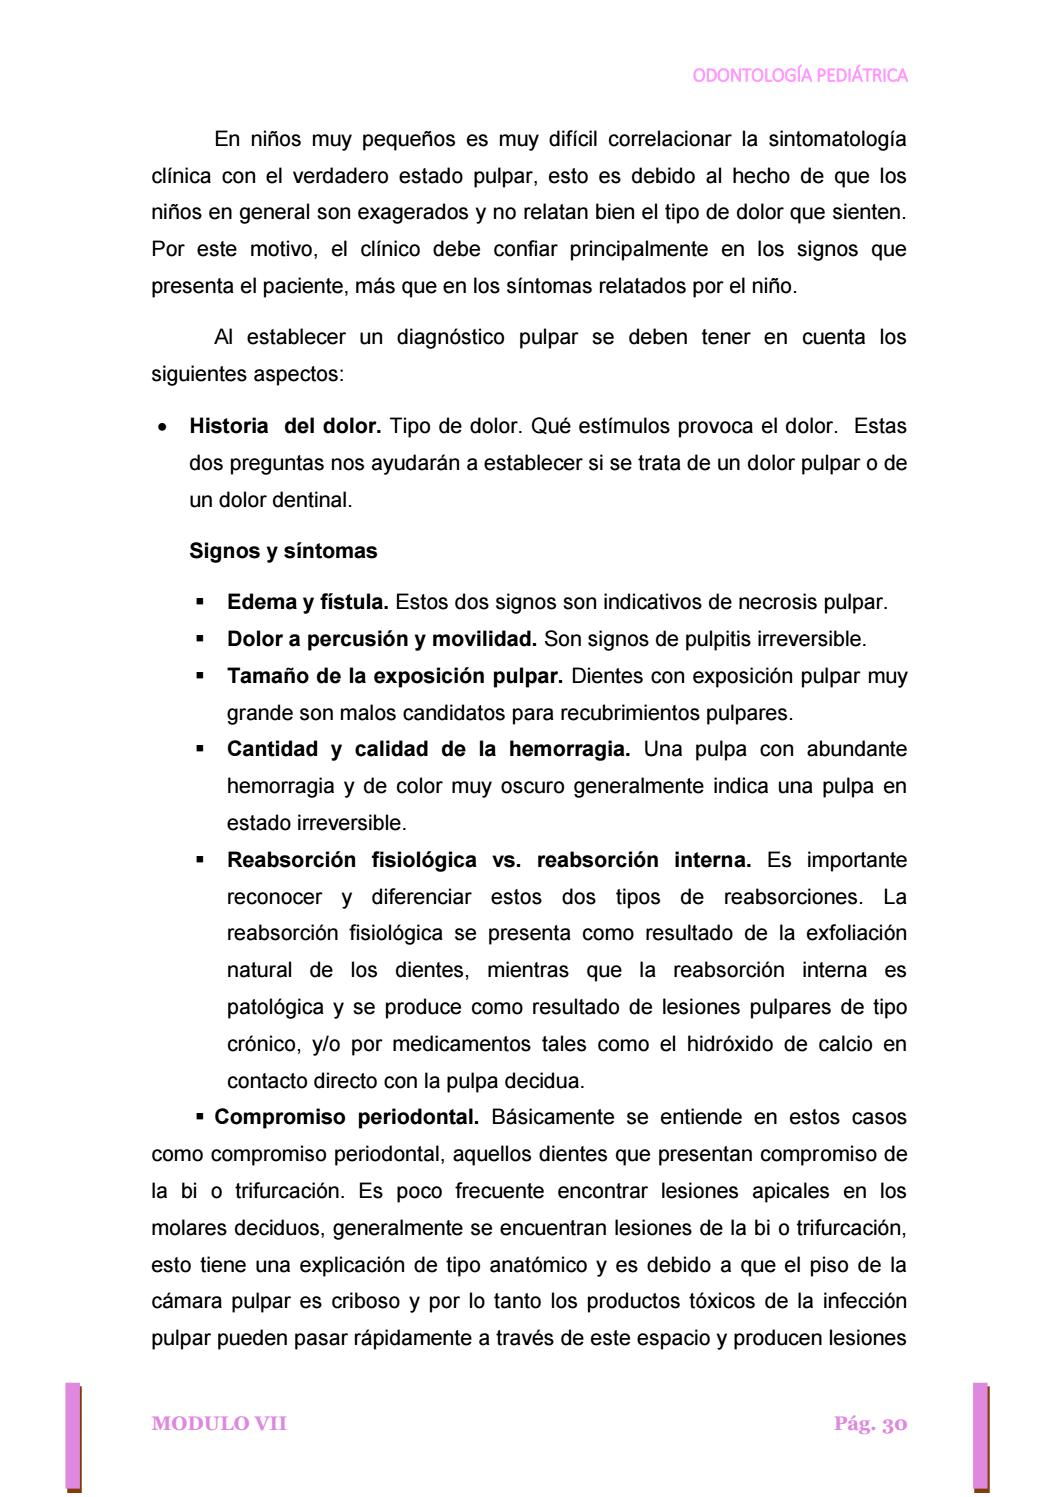 Odontologia mod 07 by lavcanleo - issuu